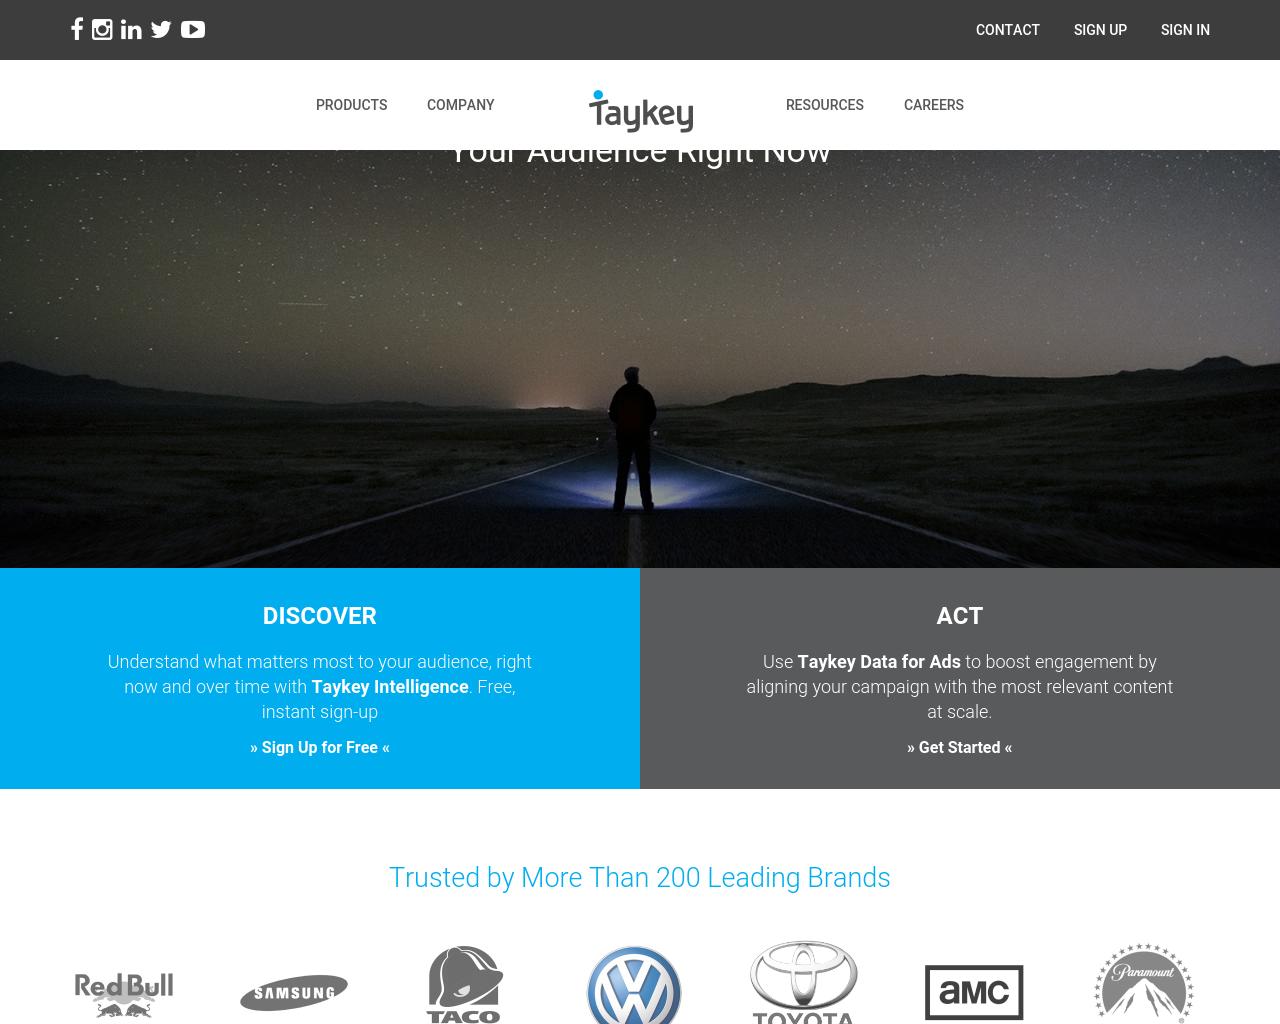 Taykey-Advertising-Reviews-Pricing